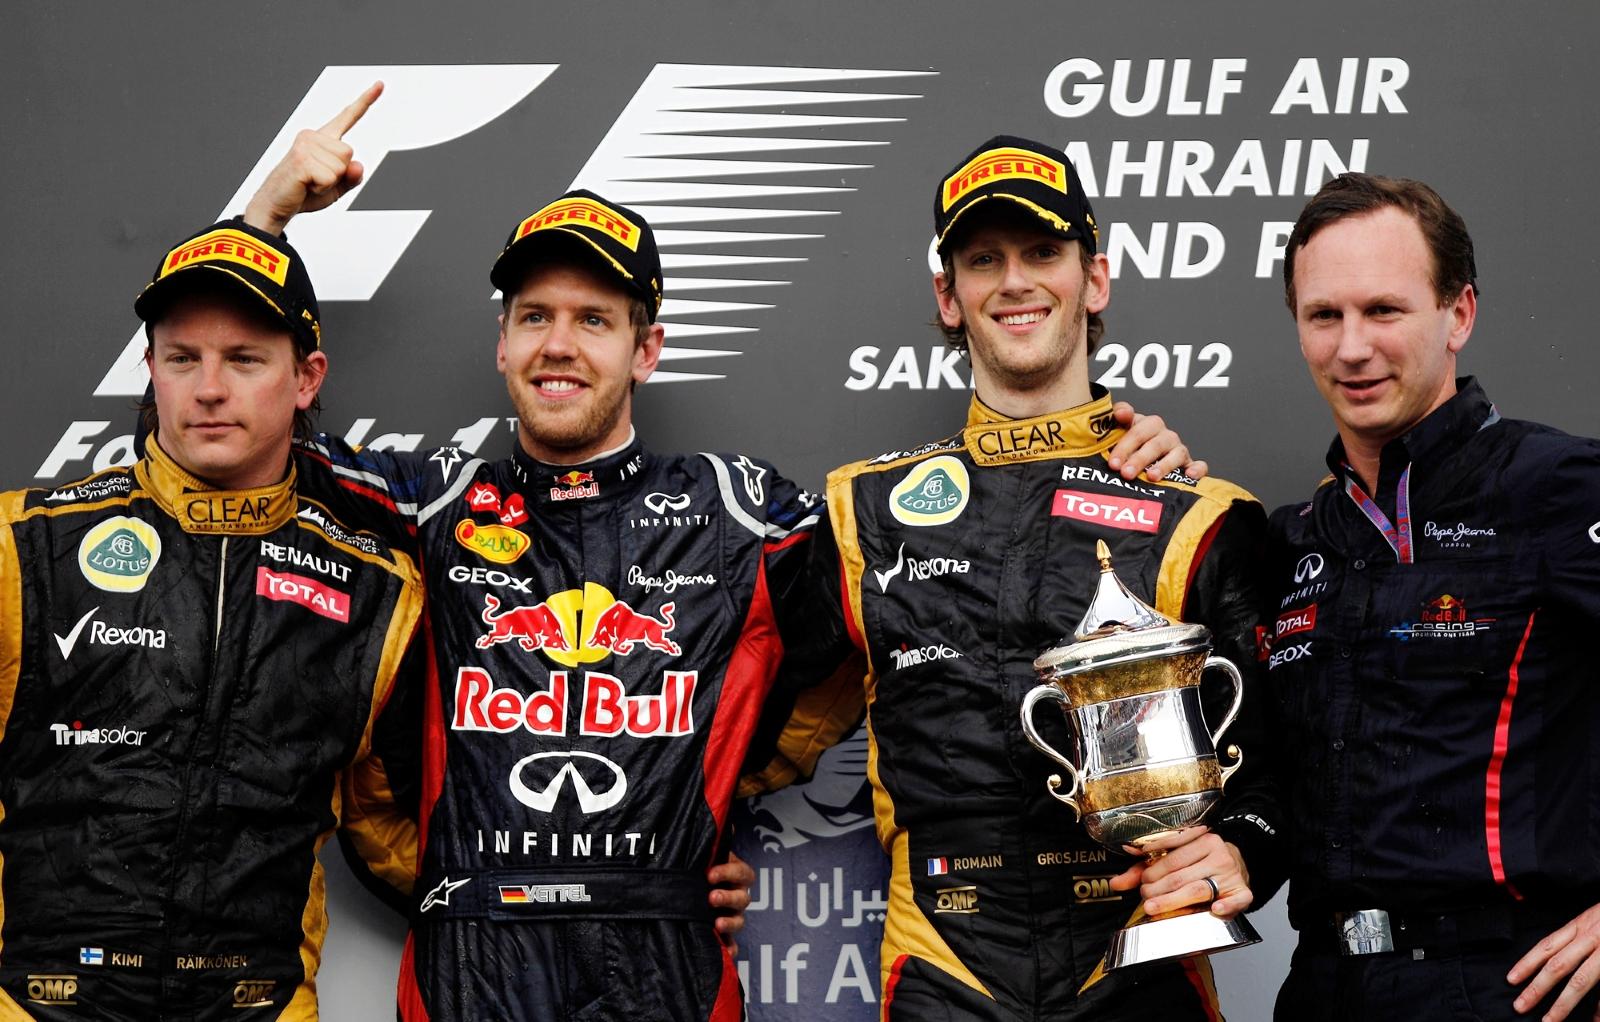 vettel raikkonen grosjean bahrain 2012 podium